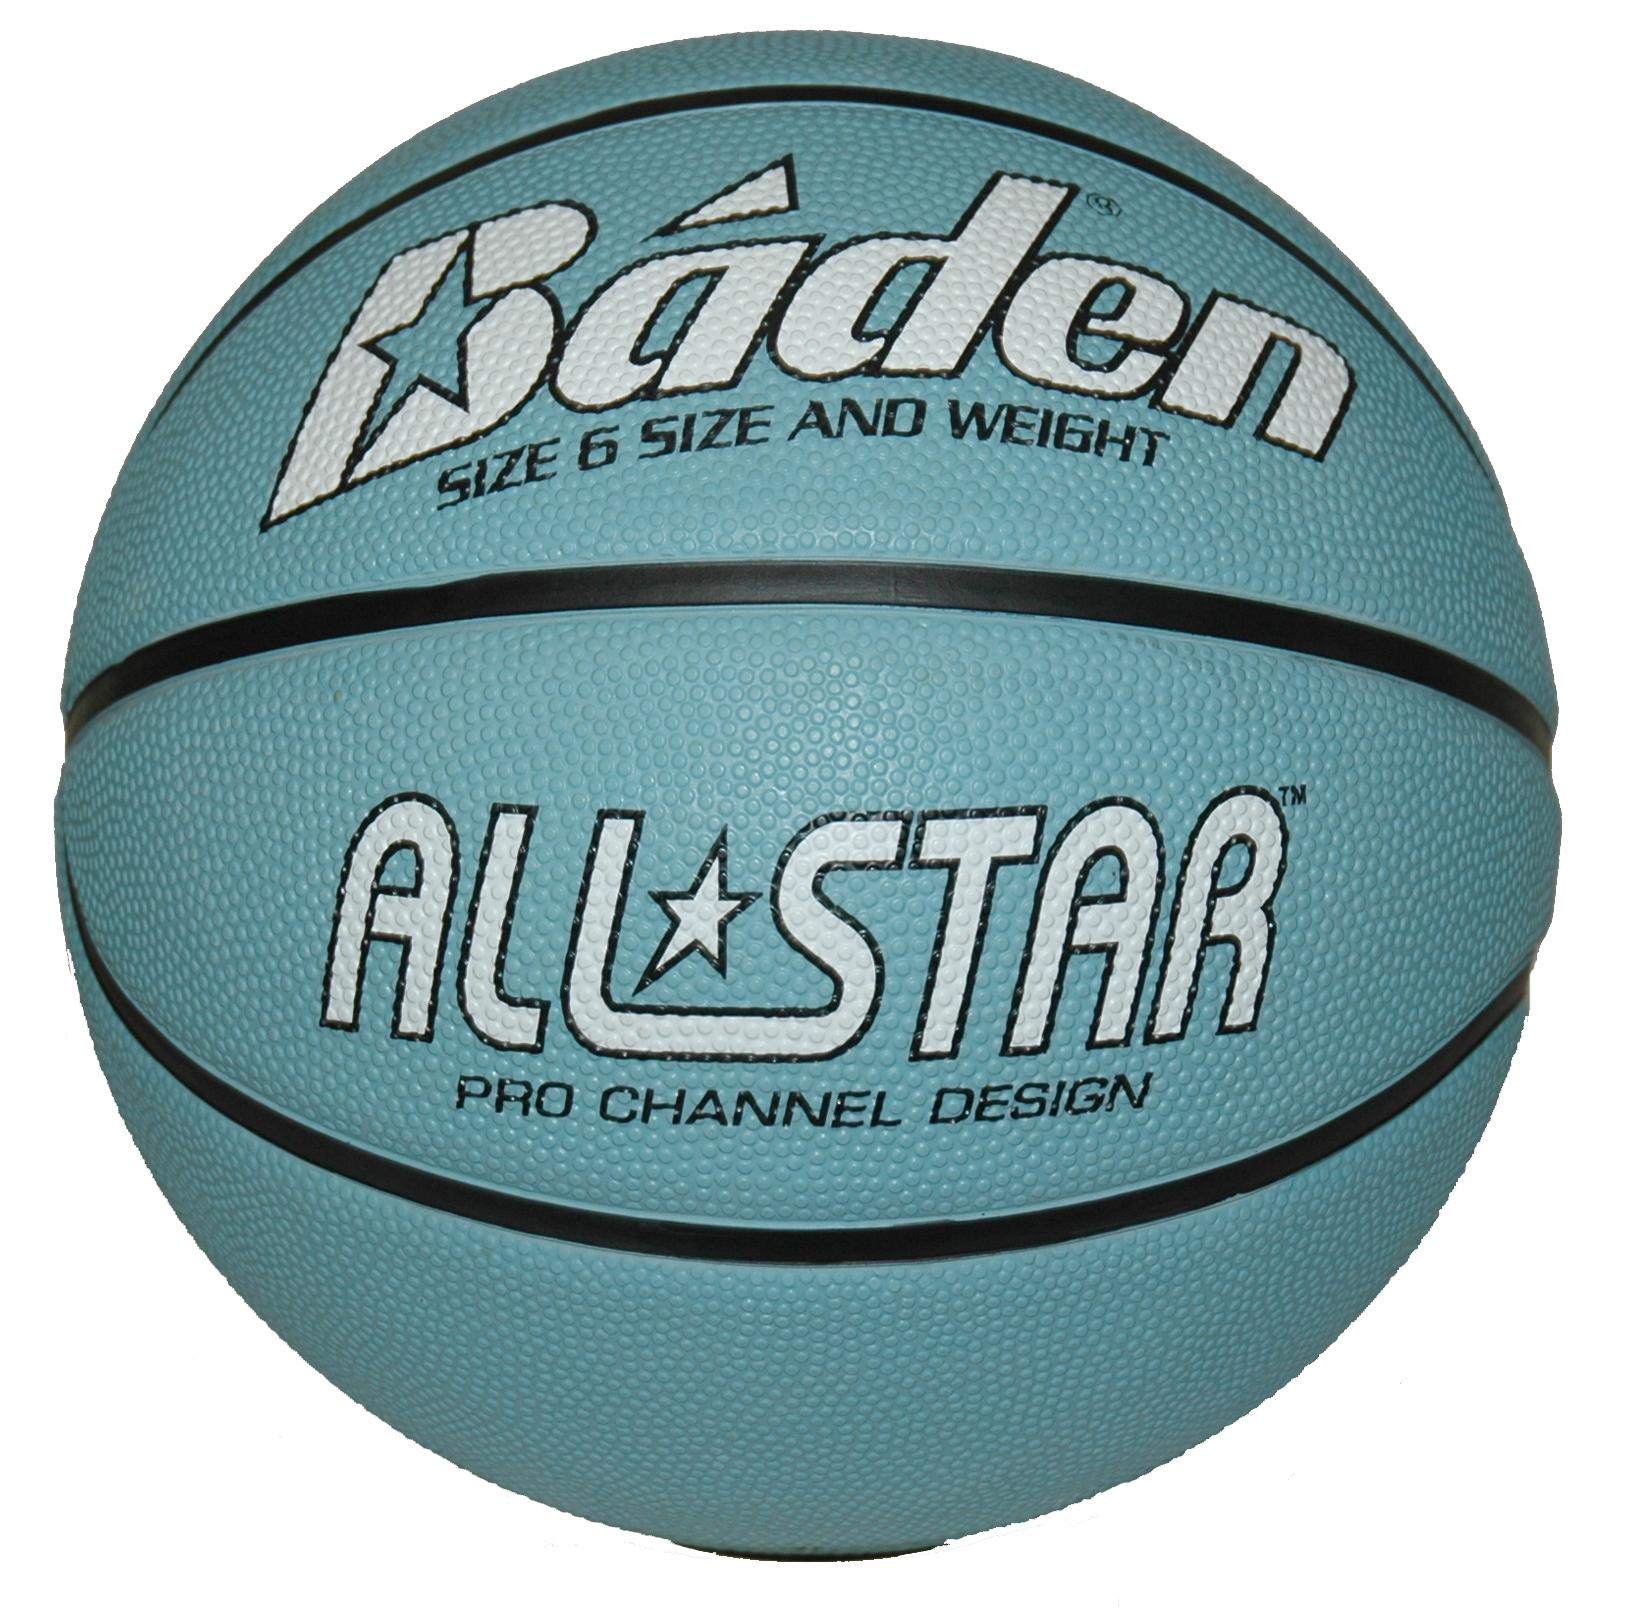 Baden All Star Basketball - Size 6, Blue